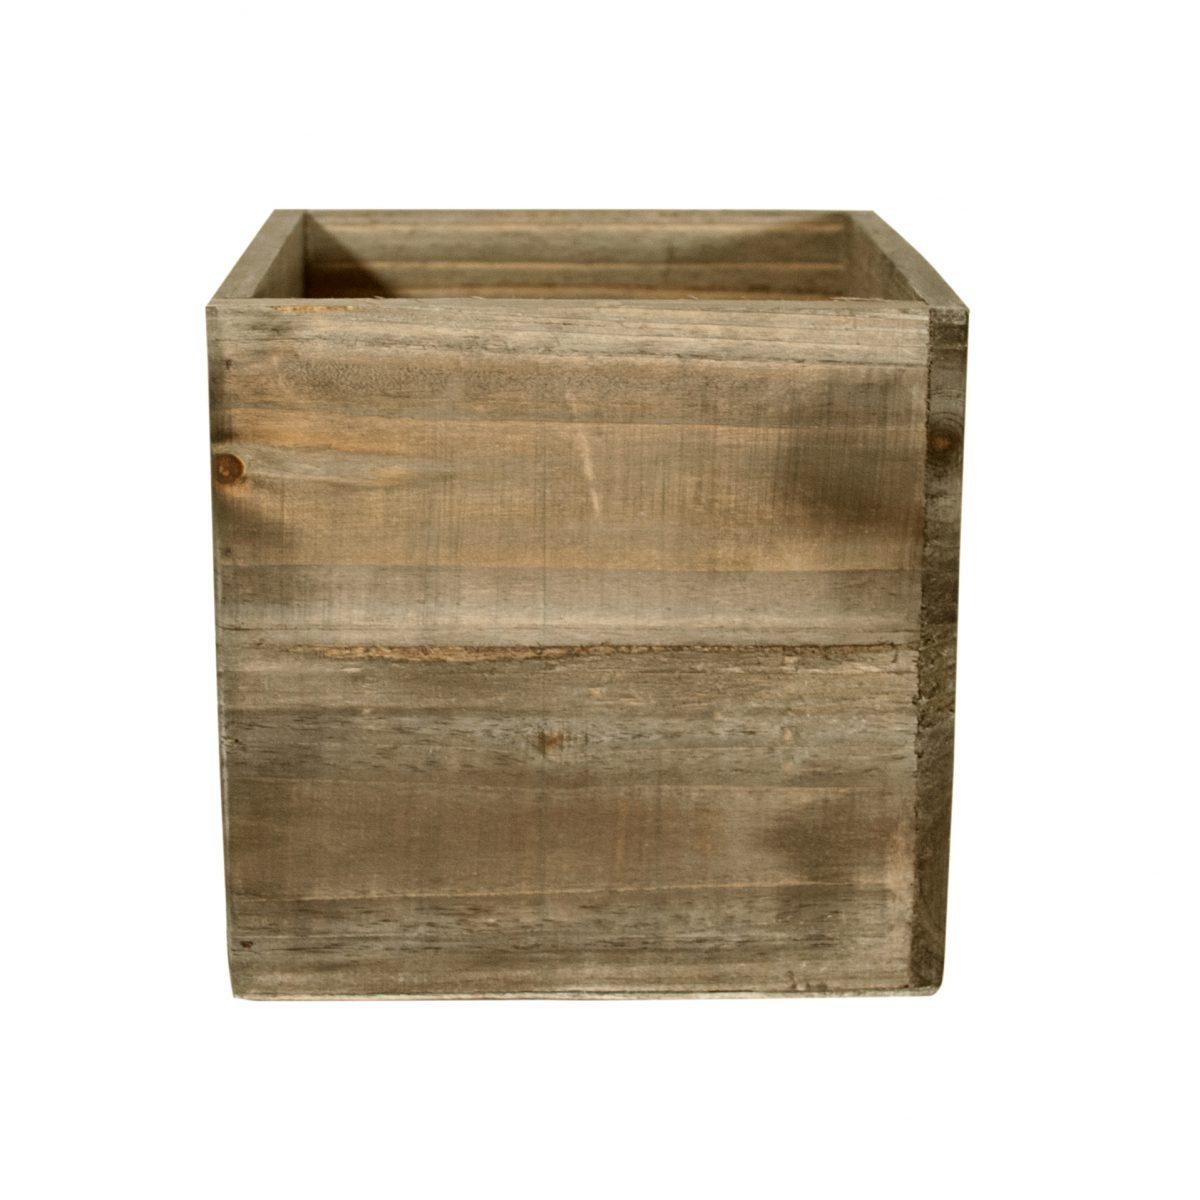 wooden planter box square - Wood Planter Box